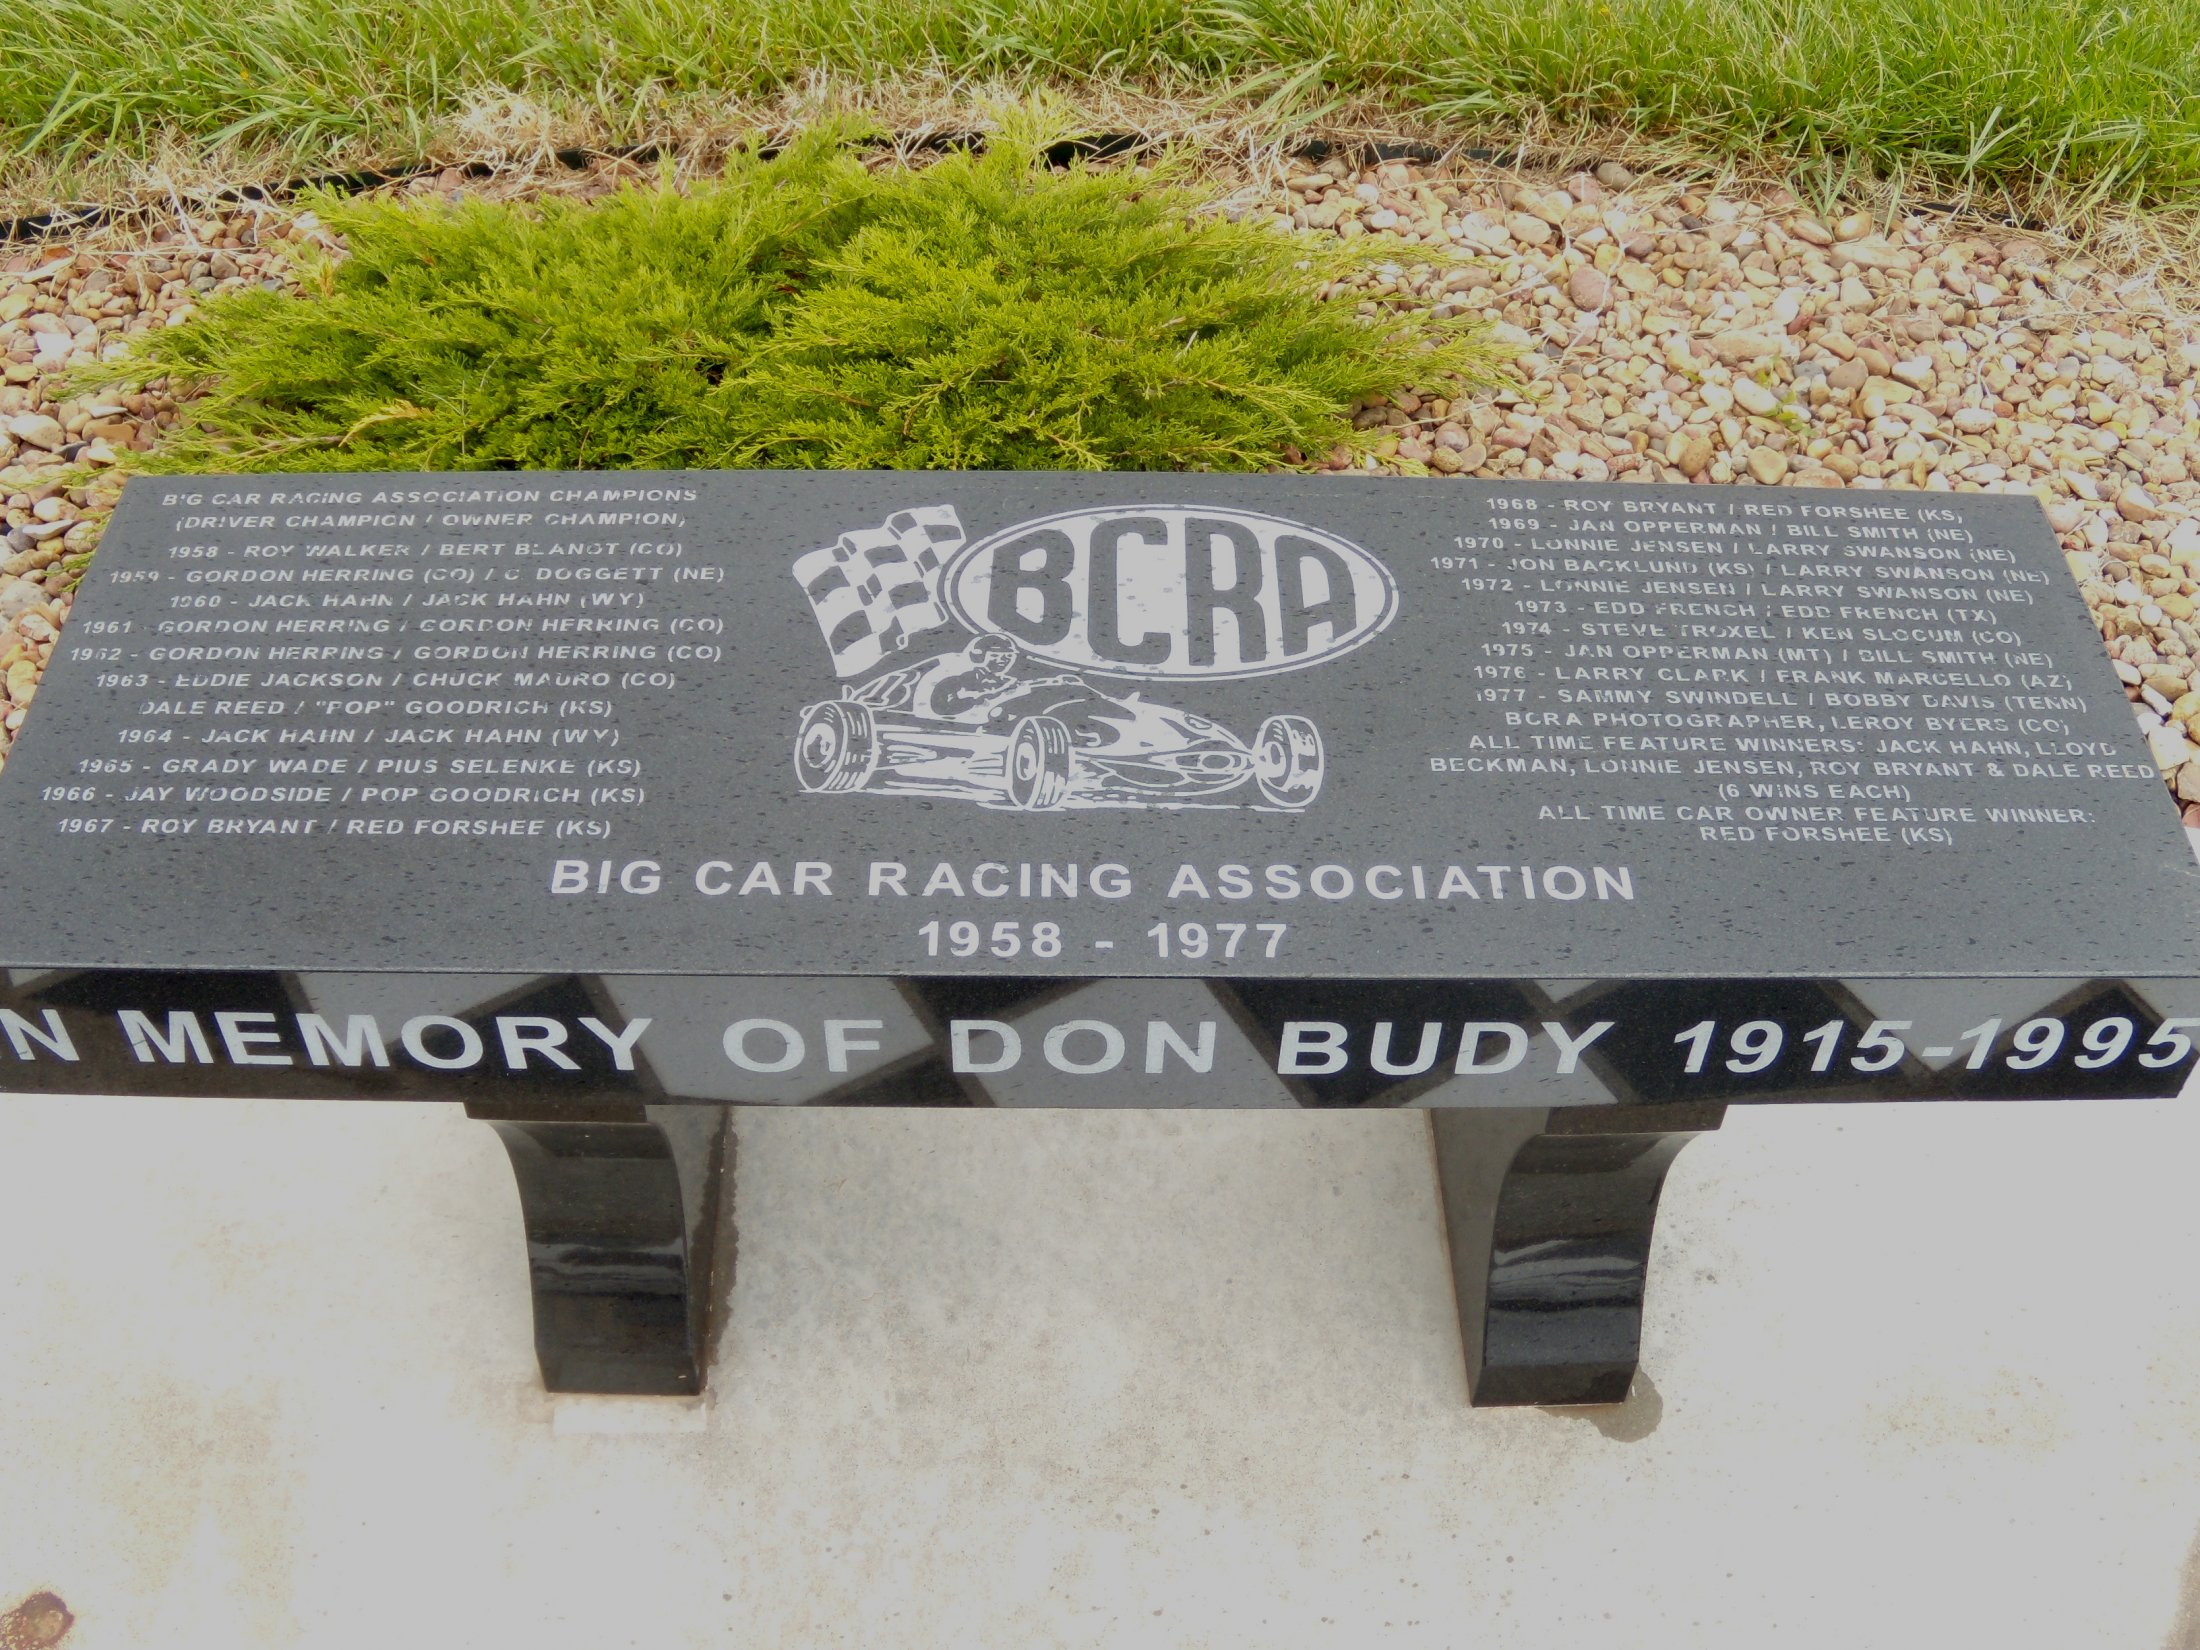 BCRA Commemorative Bench - Belleville, Ks